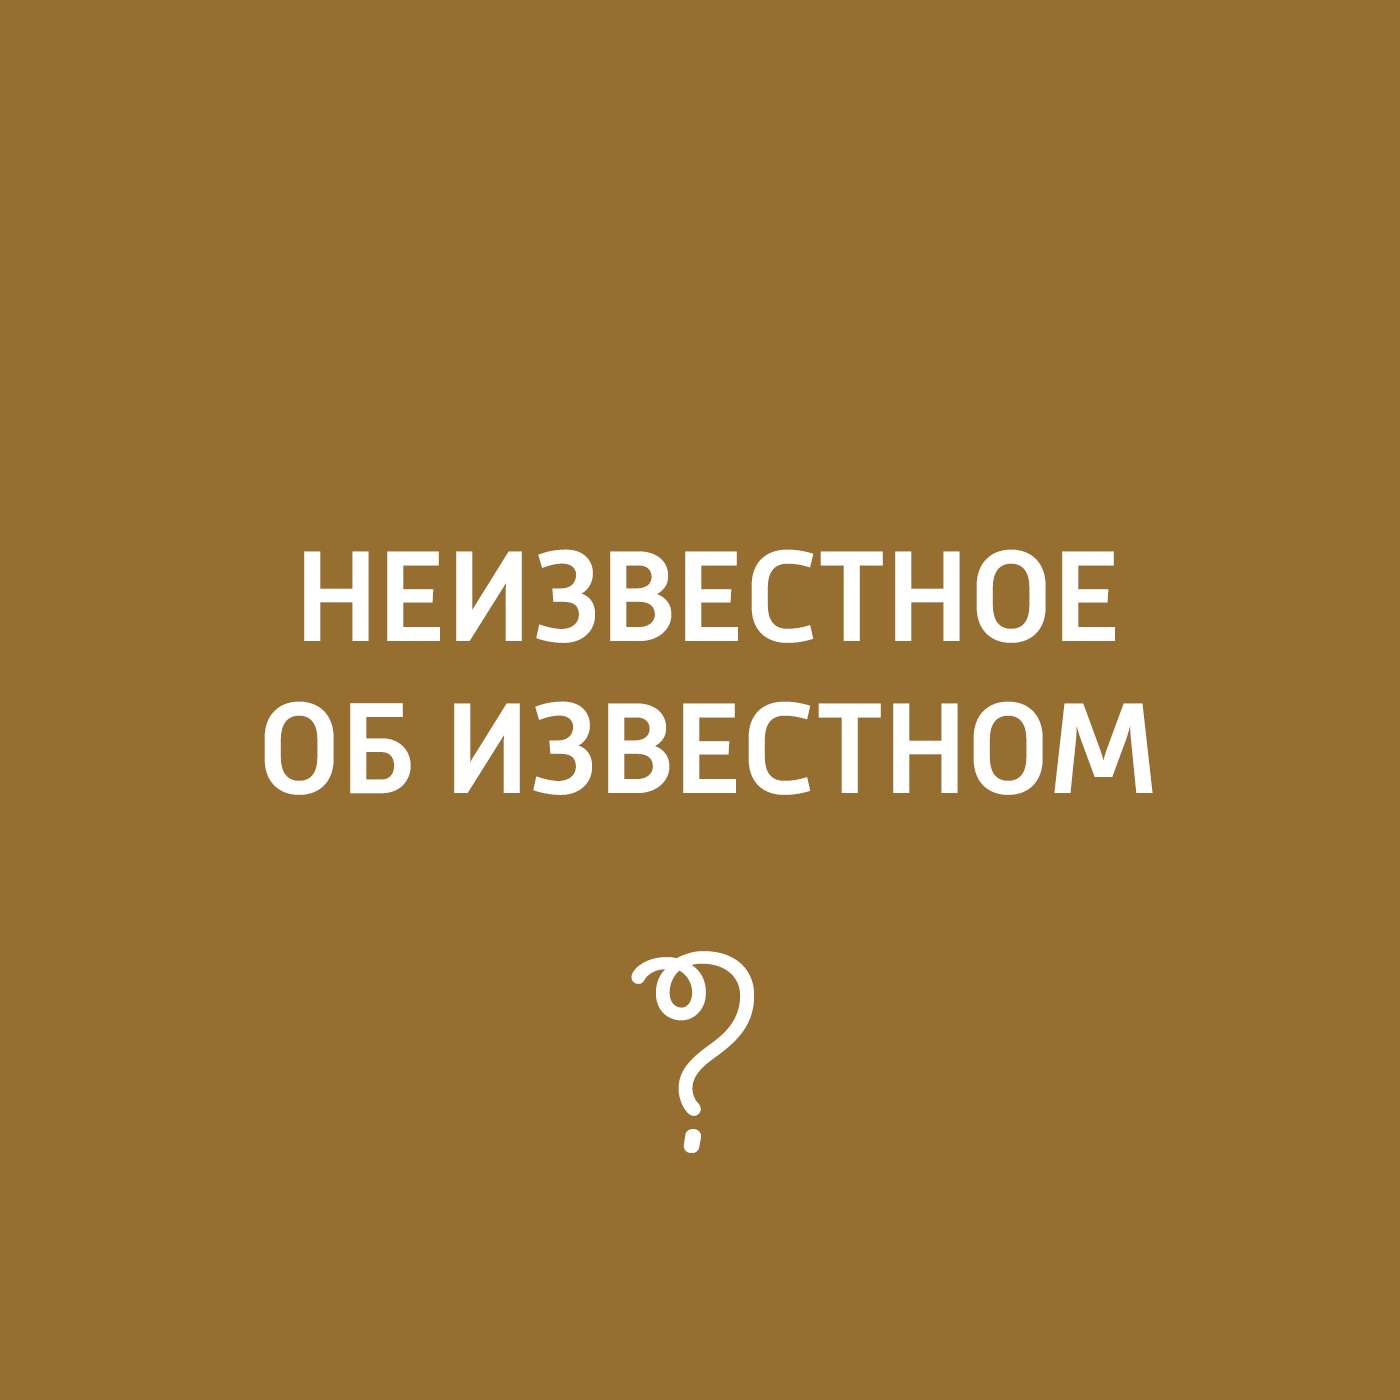 Творческий коллектив программы «Пора домой» Архитектура Бориса Иофана green sandalwood combed wooden head neck mammary gland meridian lymphatic massage comb wide teeth comb